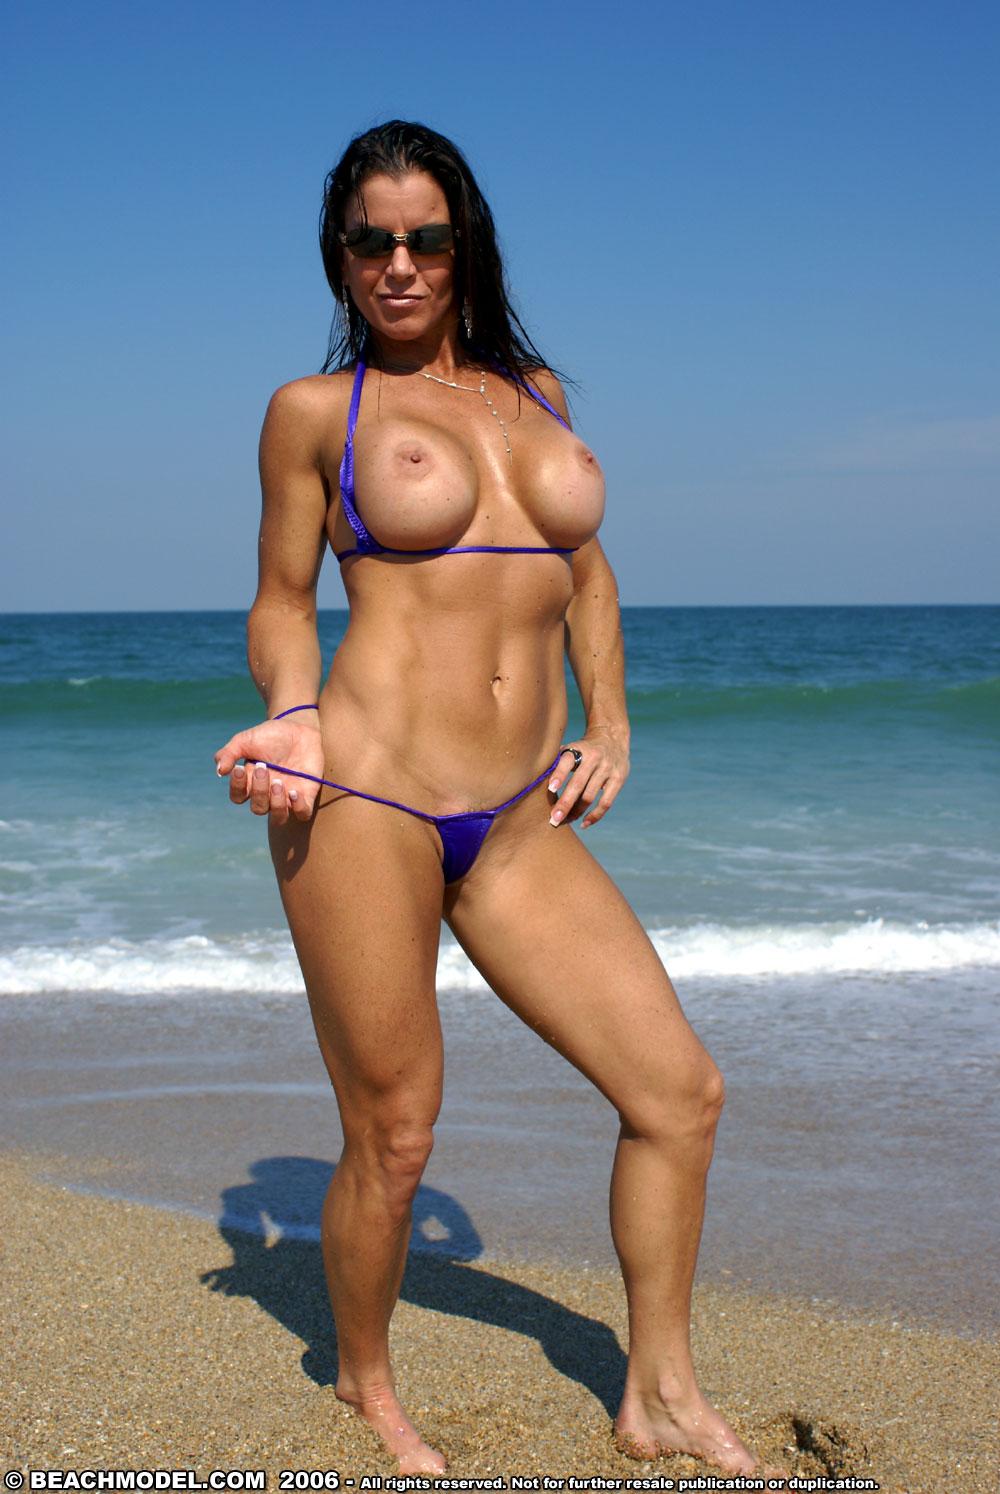 Intelligible Milf bikini photos remarkable words